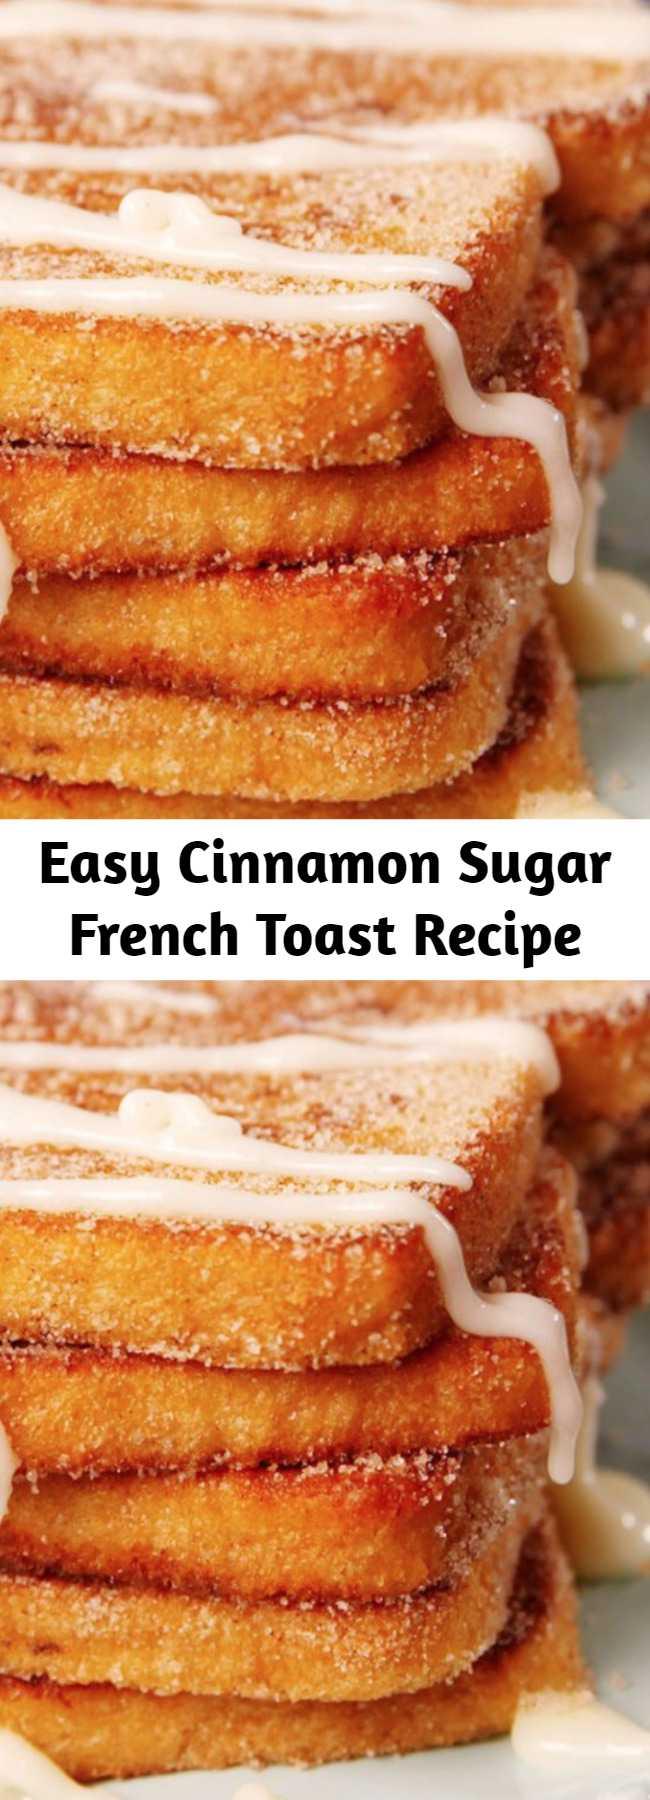 Easy Cinnamon Sugar French Toast Recipe - Churro-fy your breakfast! 😏 #easy #recipe #churro #frenchtoast #breakfast #cinnamon #sugar #brunch